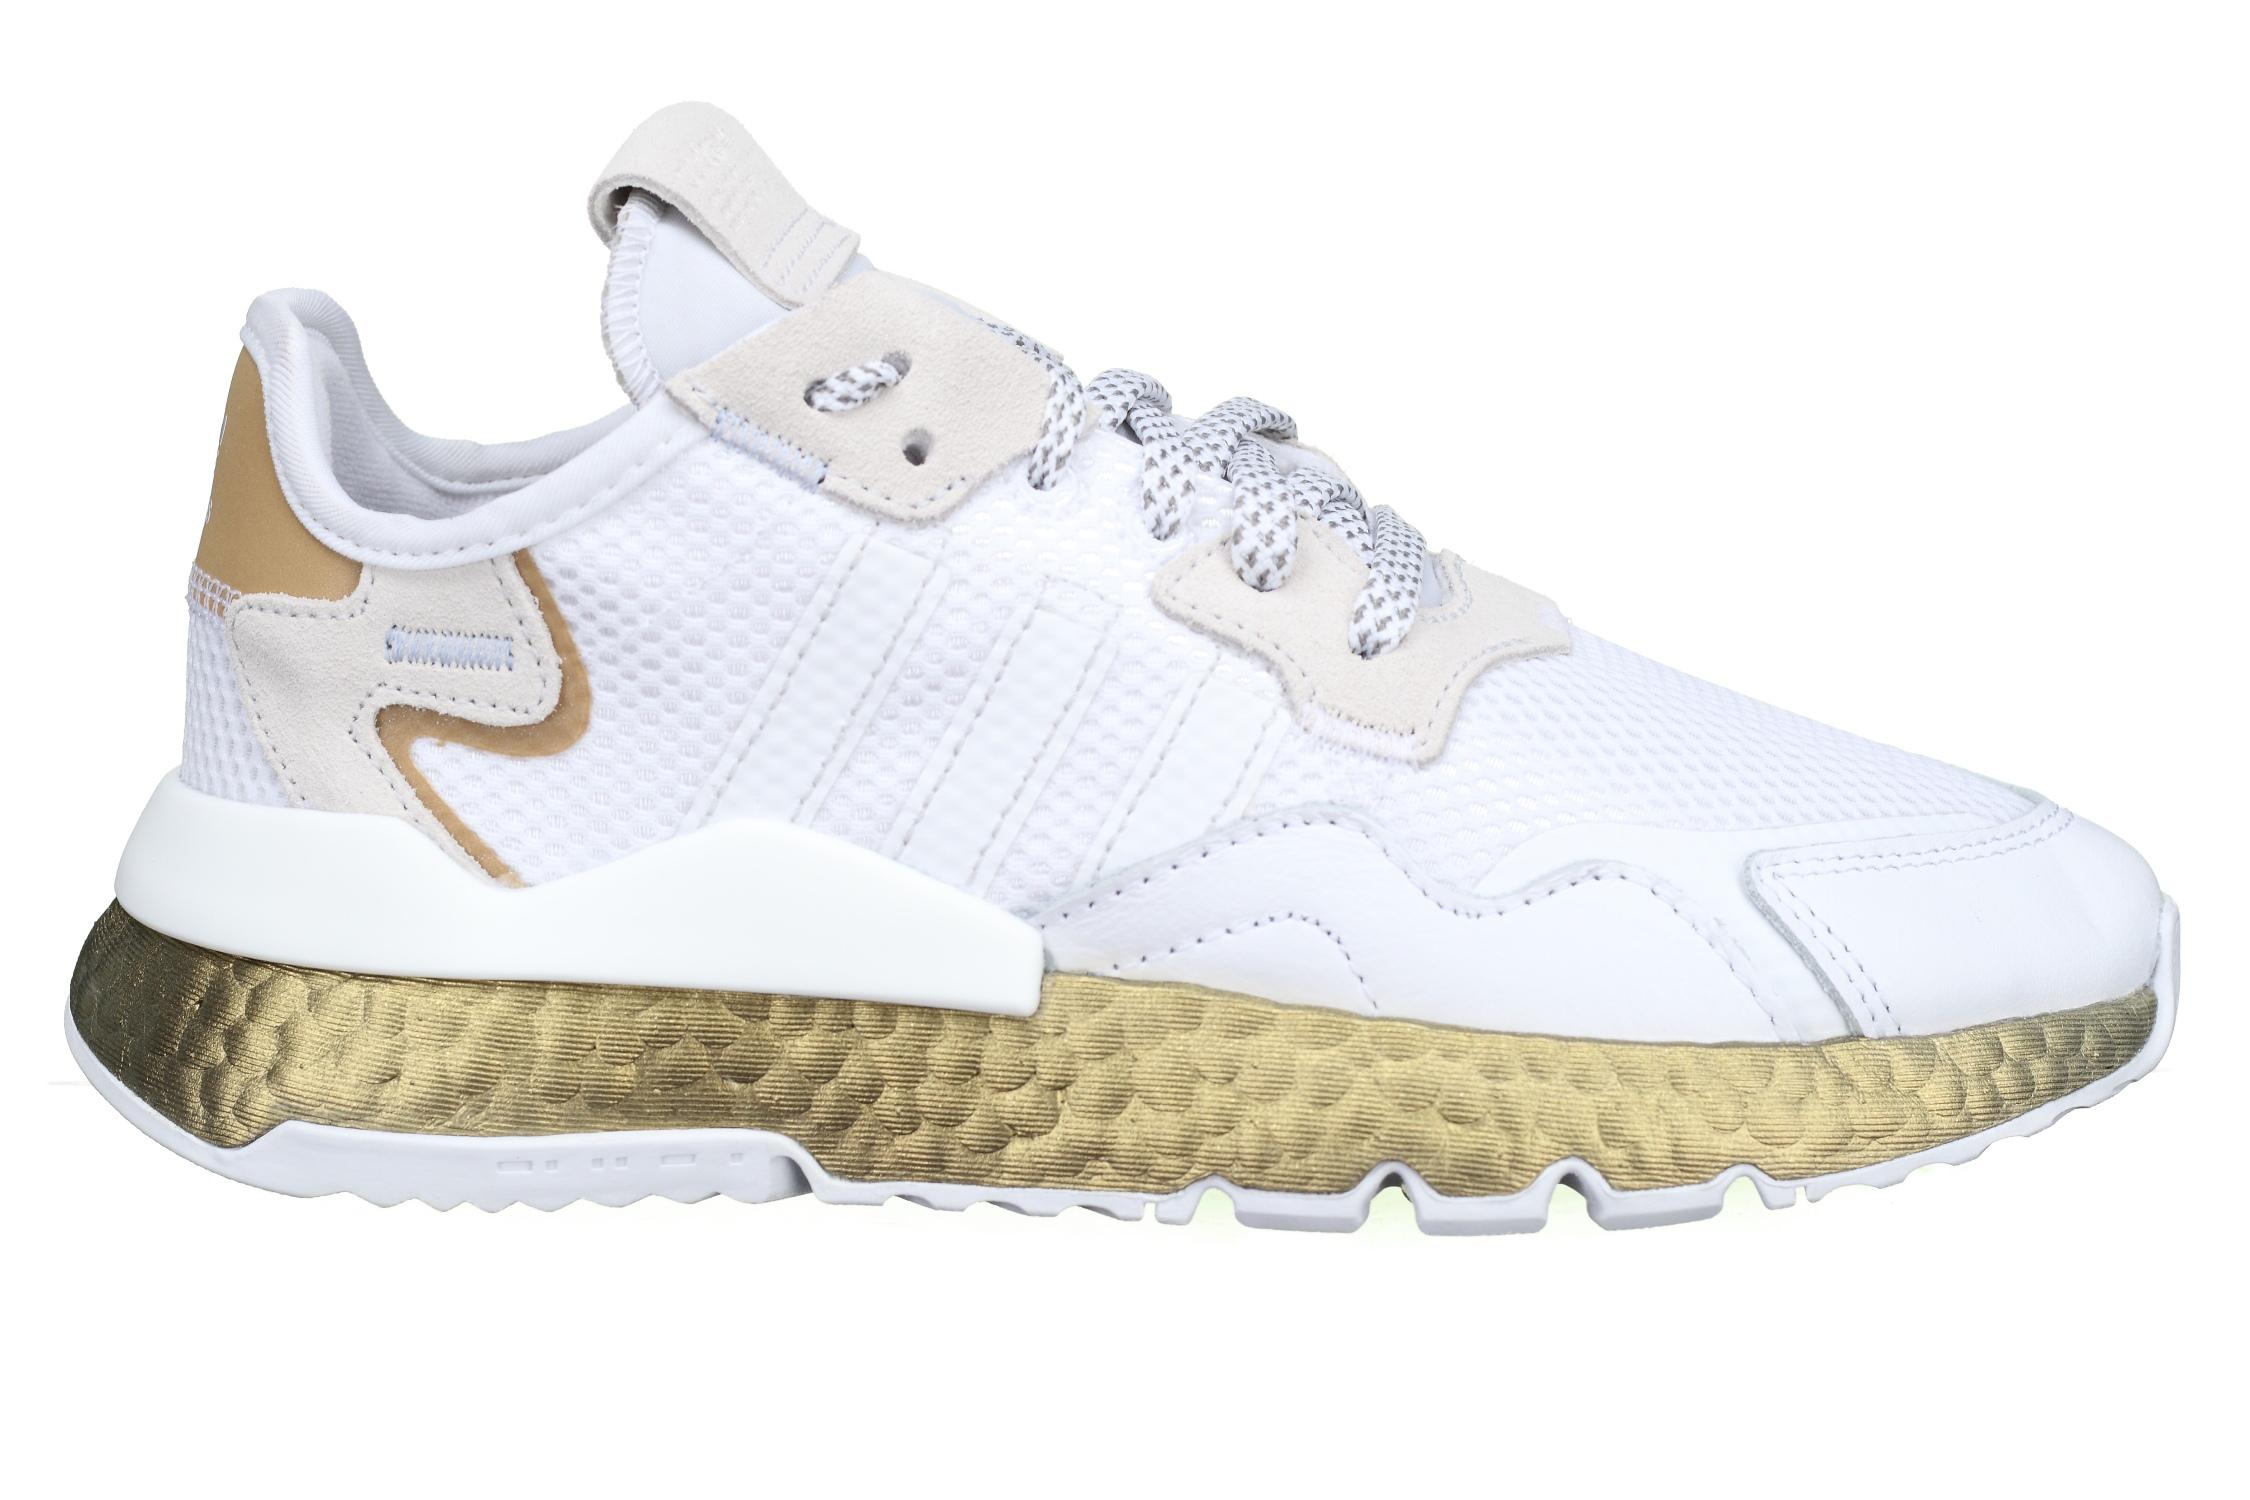 https://www.leadermode.com/187097/adidas-nite-jogger-w-fv4138-blanc.jpg